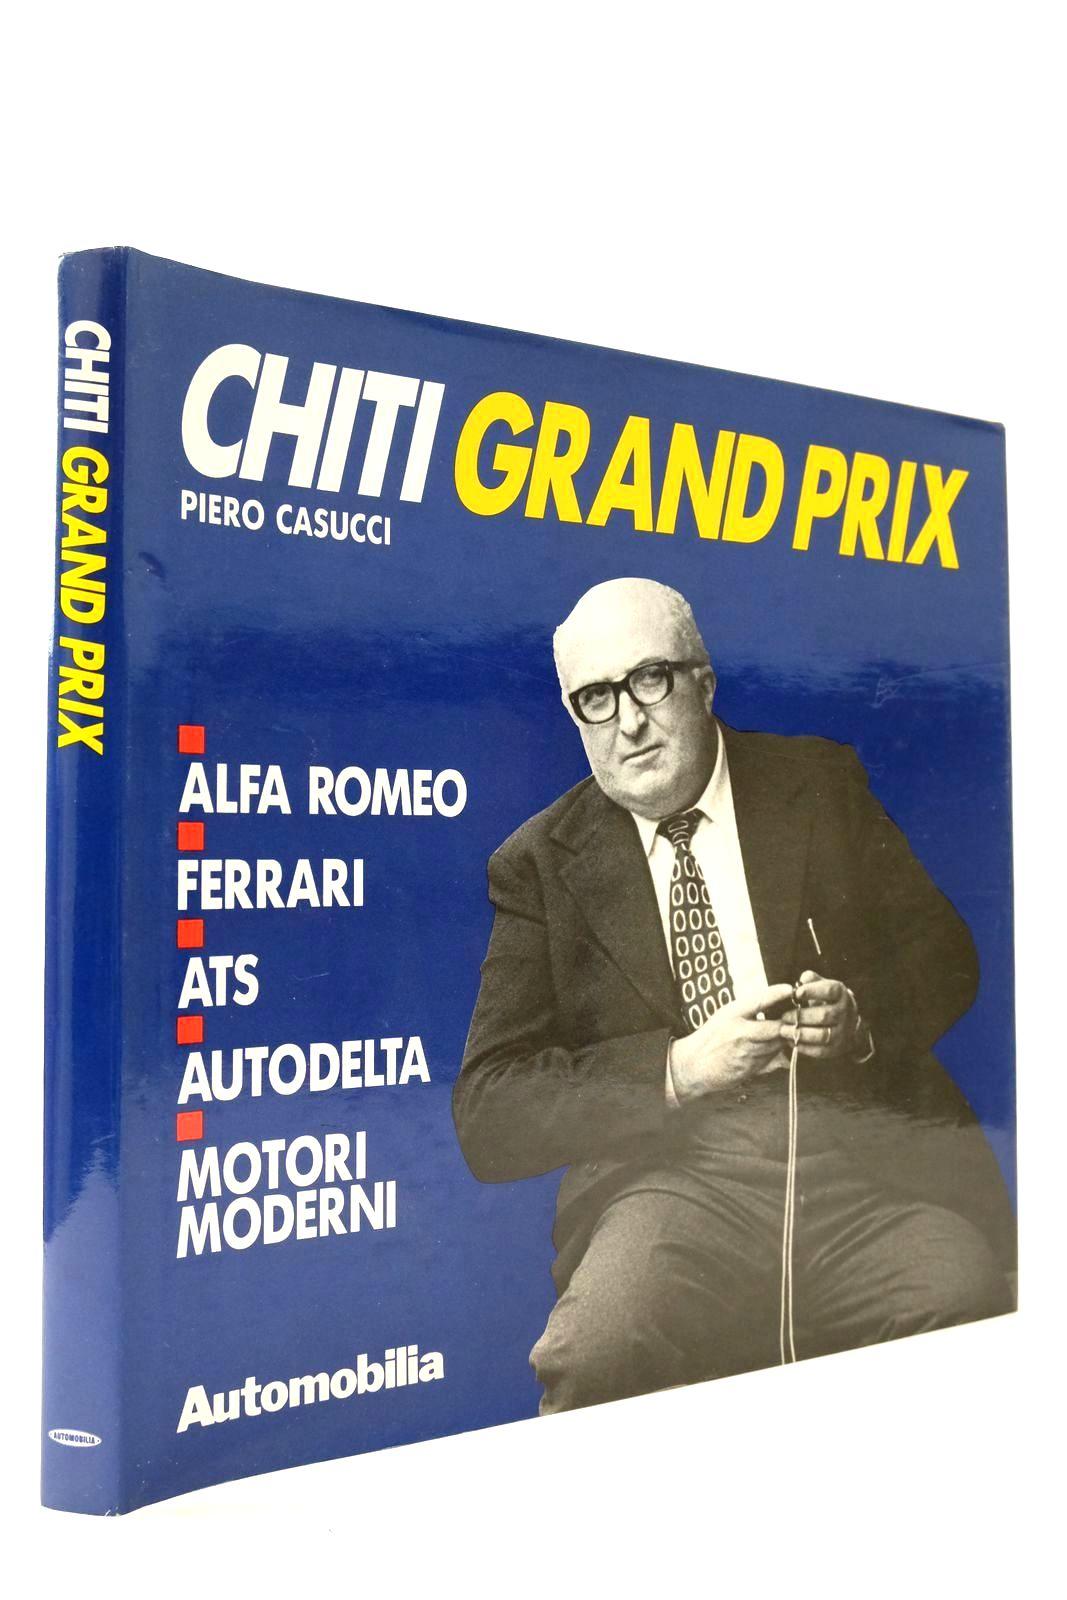 Photo of CHITI GRAND PRIX written by Casucci, Piero published by Automobilia (STOCK CODE: 2132908)  for sale by Stella & Rose's Books